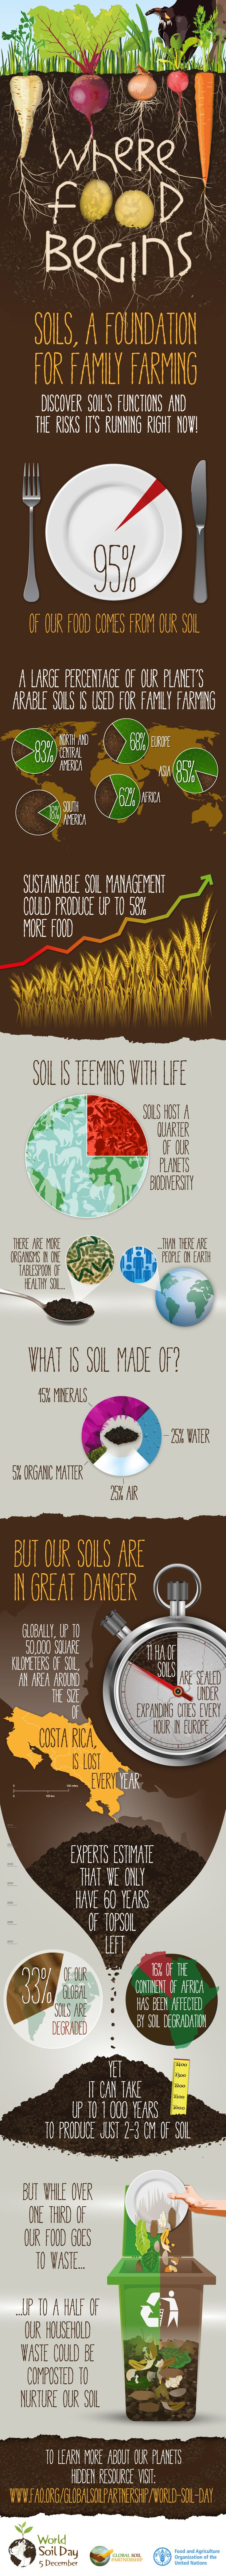 The International Year of Soil is No Dirty Joke